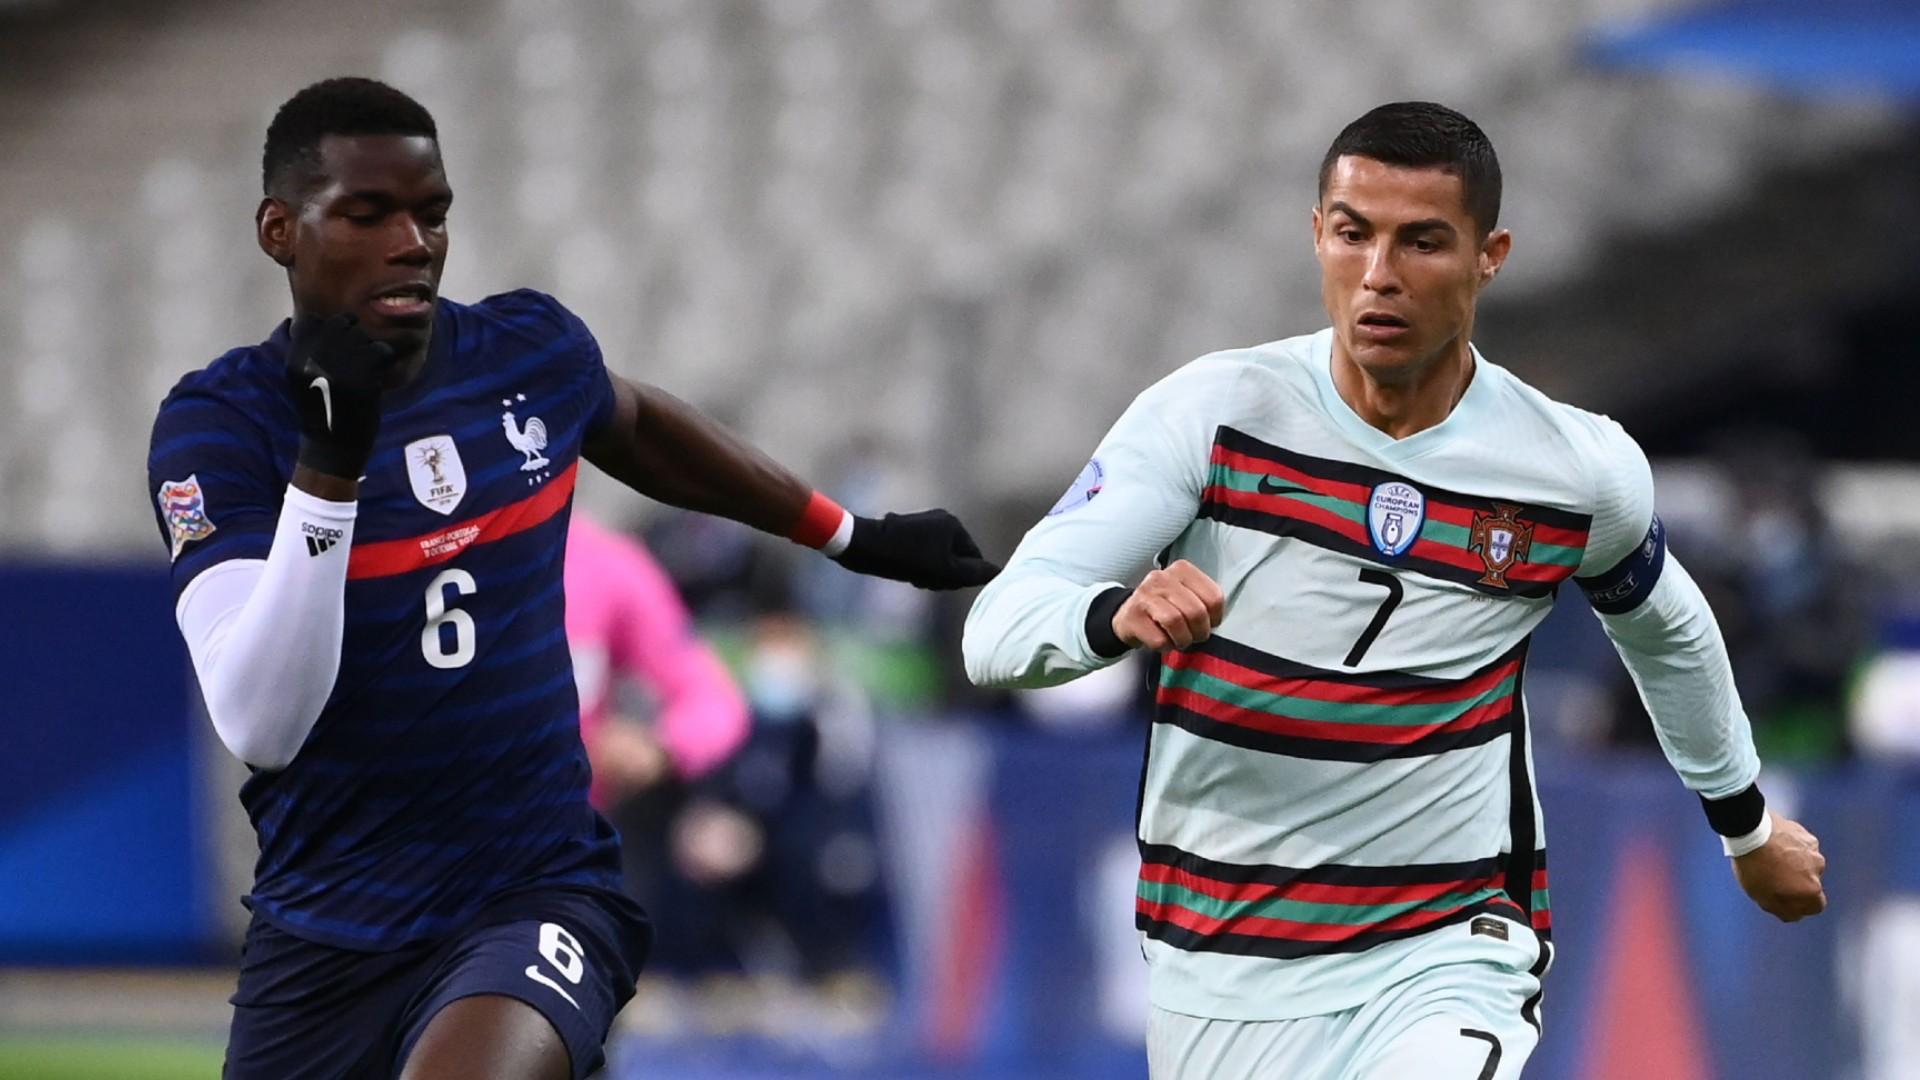 LIVE: France vs Portugal